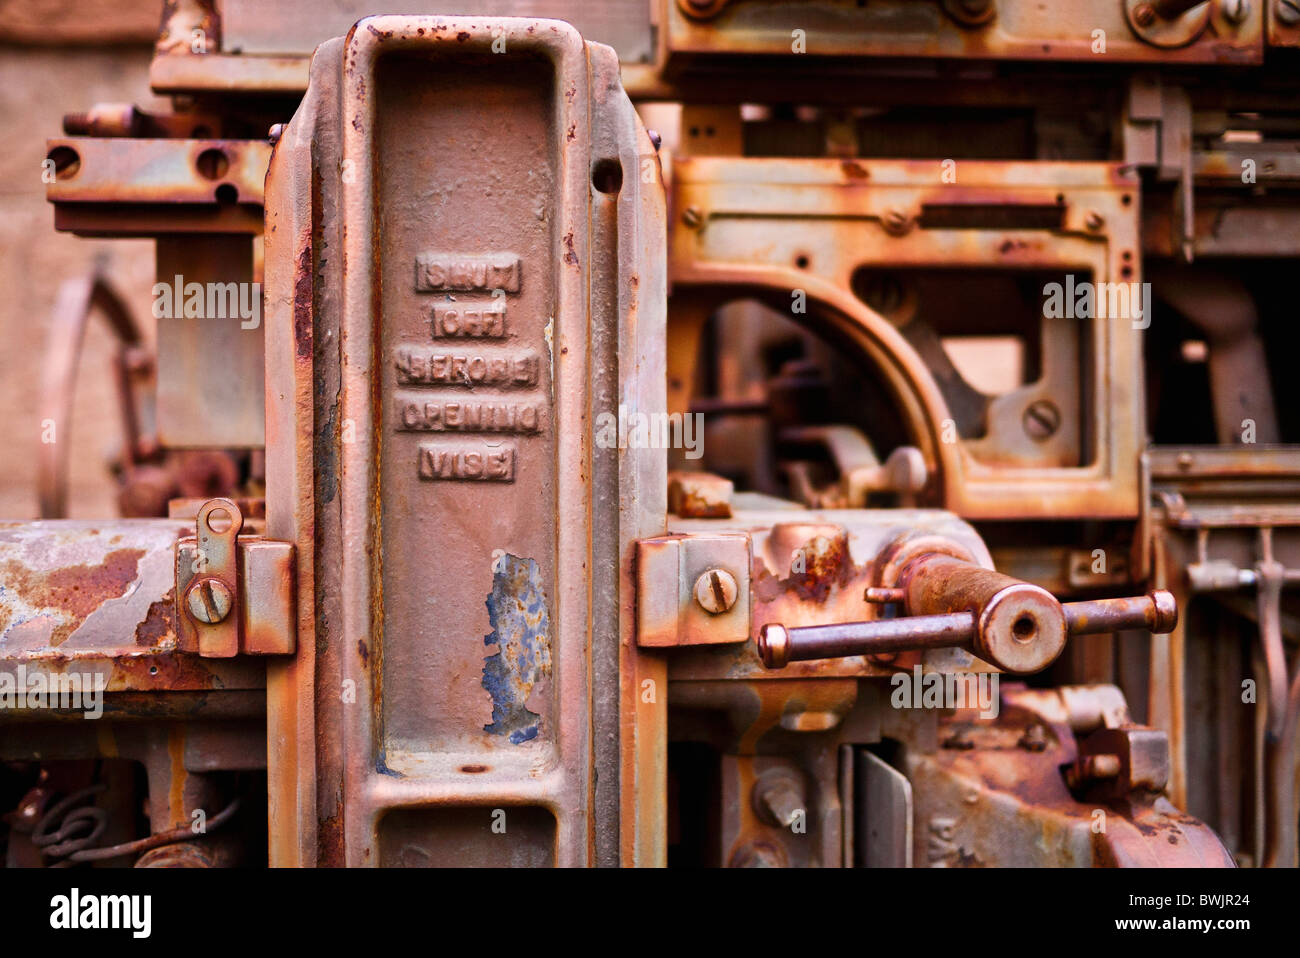 Old typesetting machine, Dolores, Colorado - Stock Image